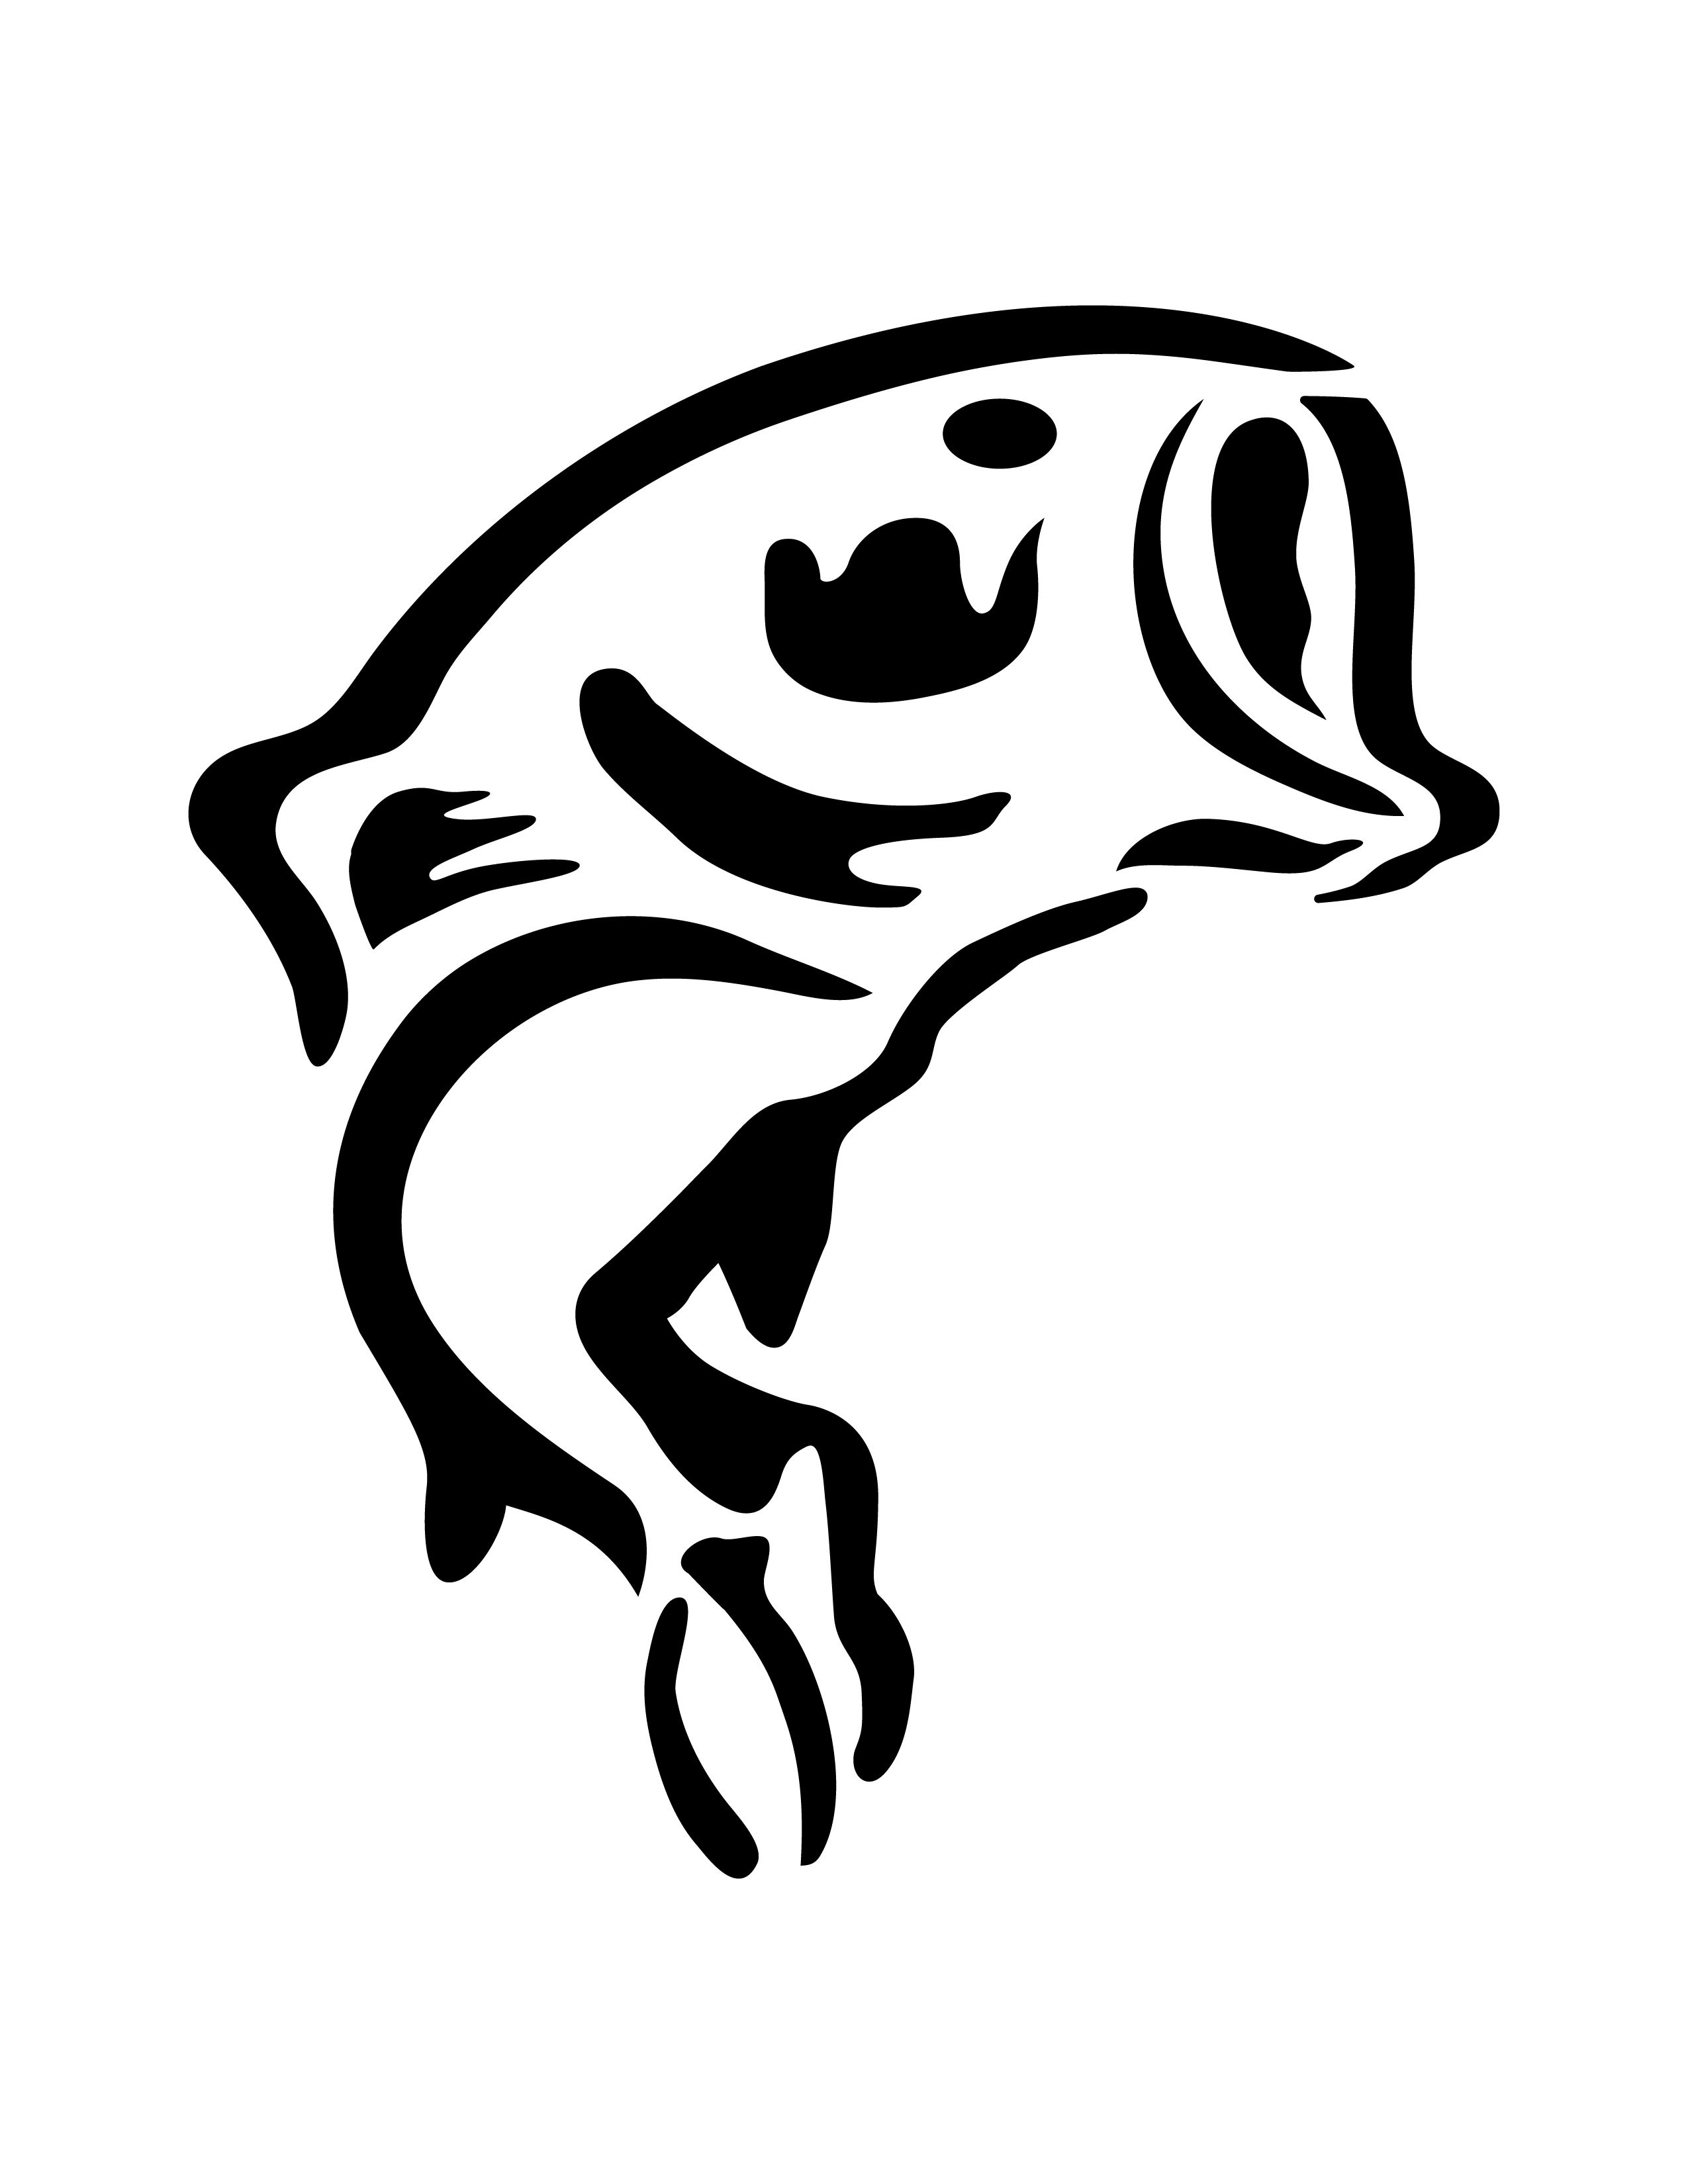 Bass fish pumpkin stencil carving patterns